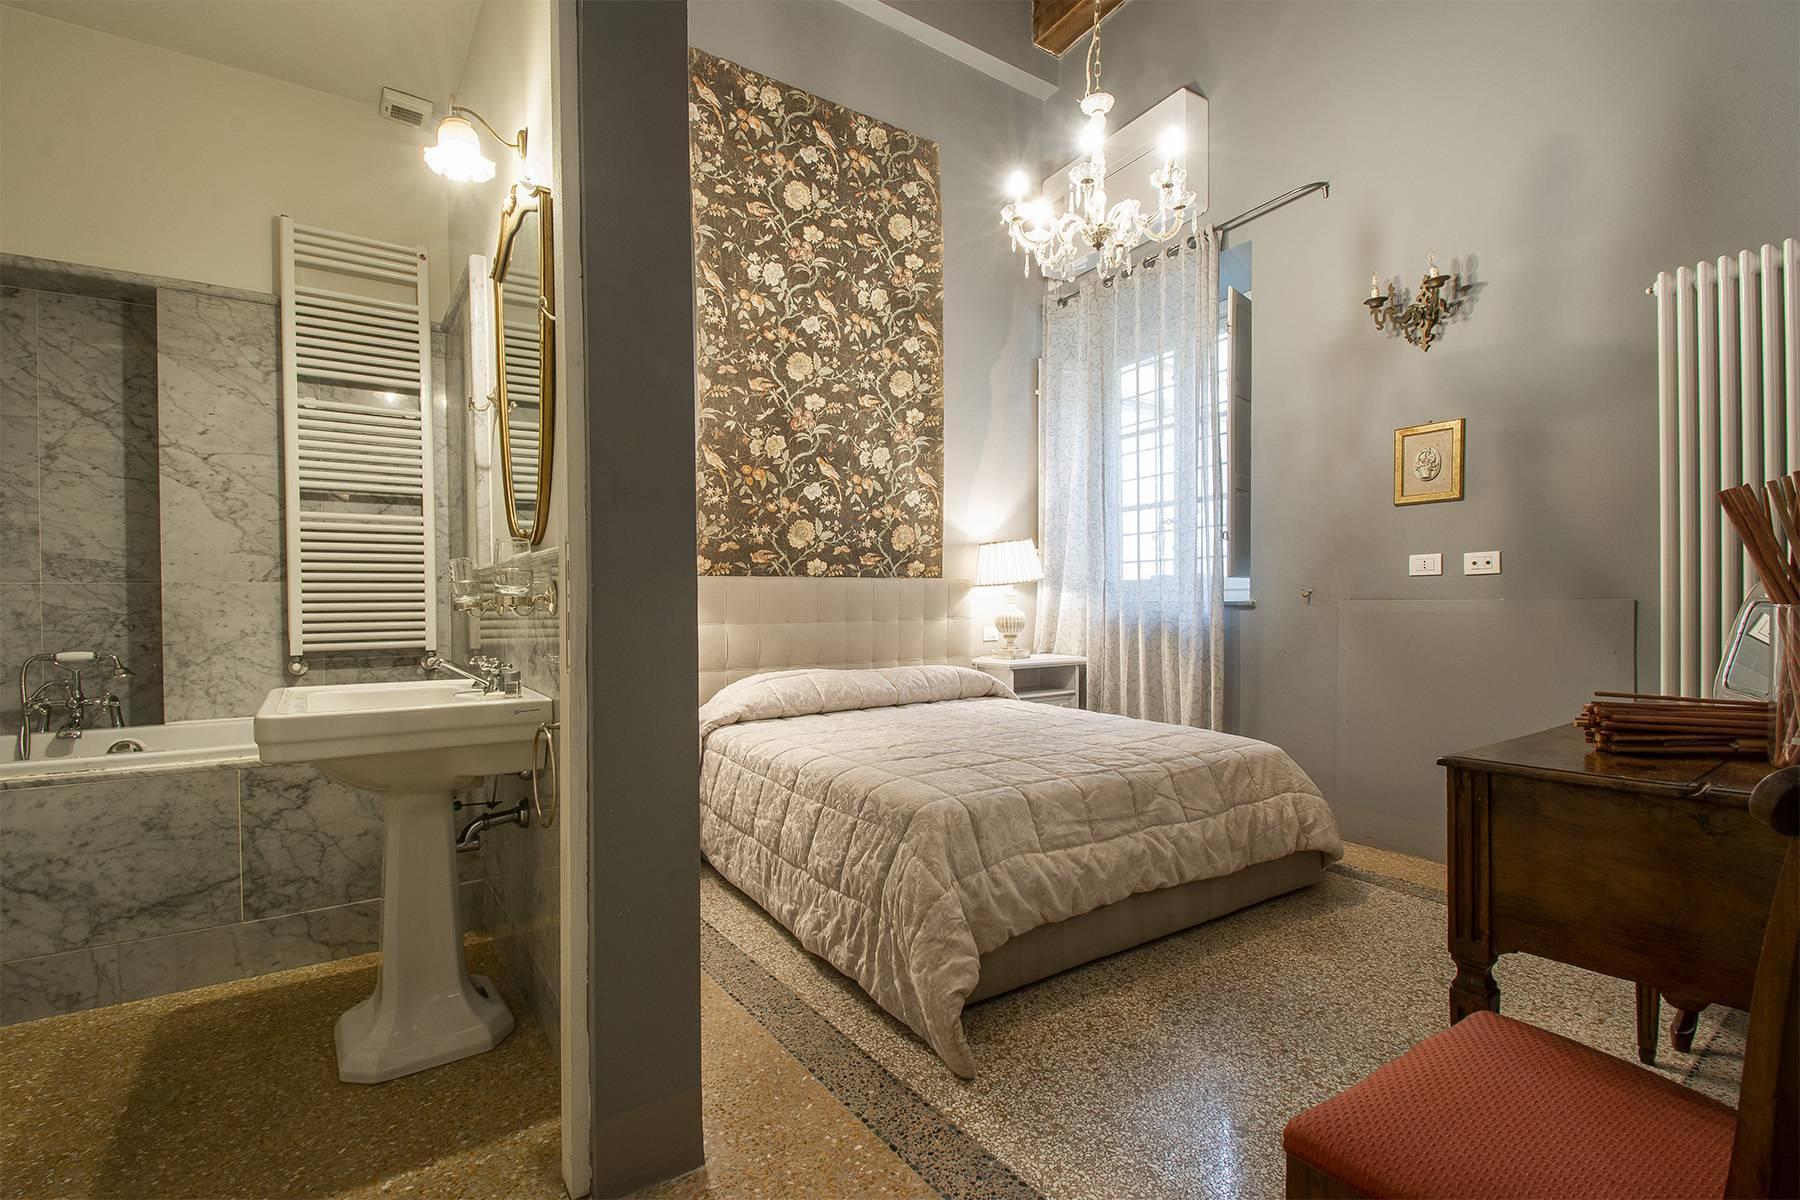 Appartement exclusif au coeur de Lucca - 18